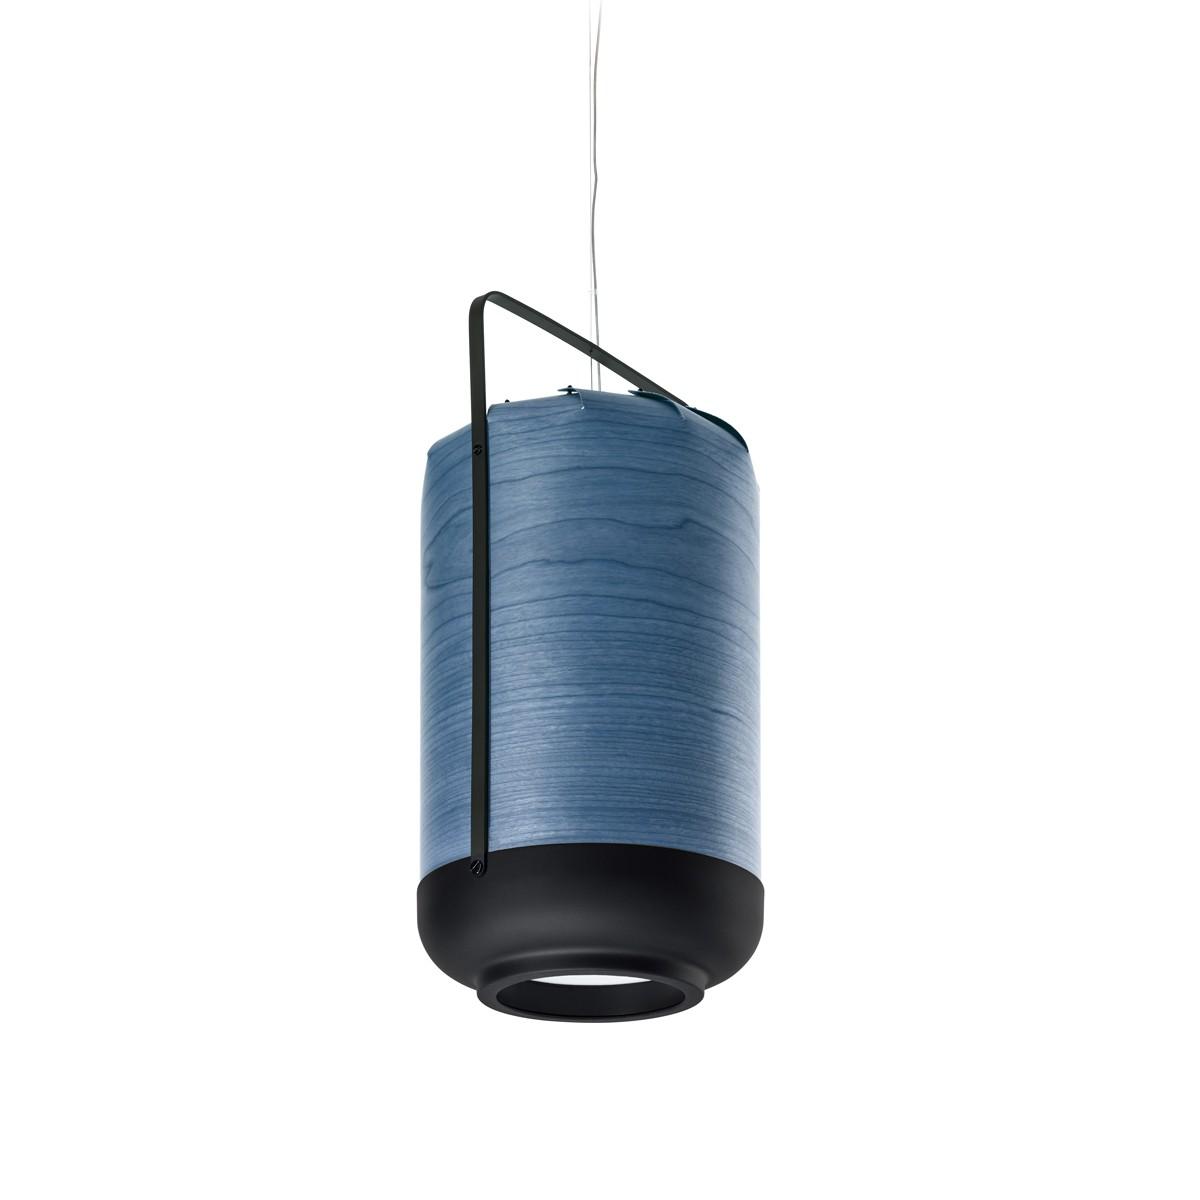 LZF Lamps Chou Tall Small Pendelleuchte, blau